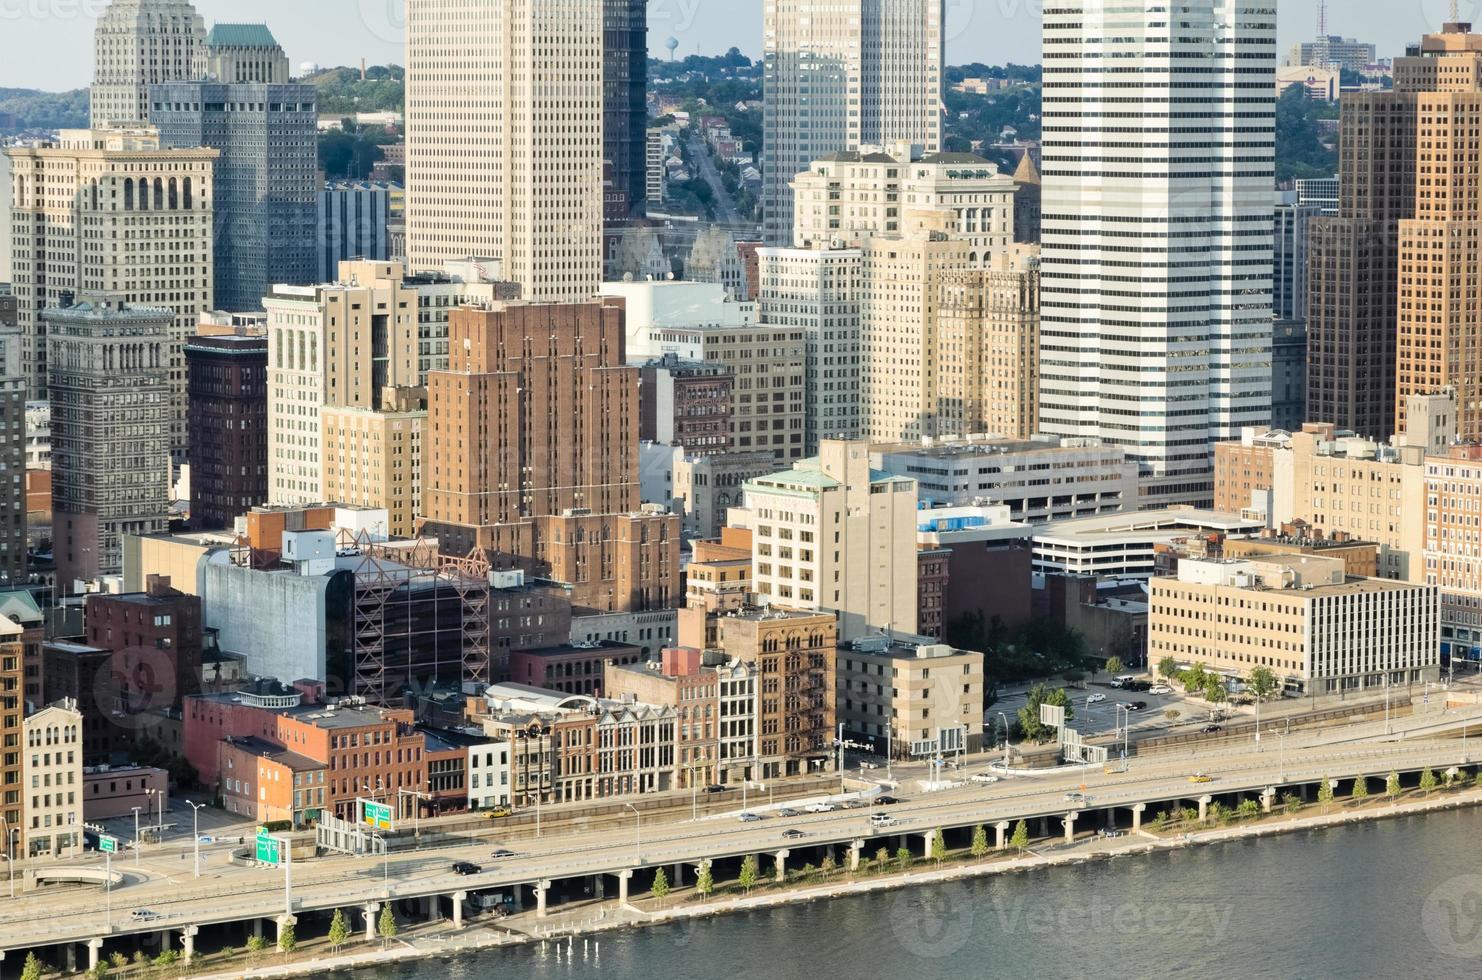 Pittsburgh Stadtbild entlang Monongahela River am späten Nachmittag foto